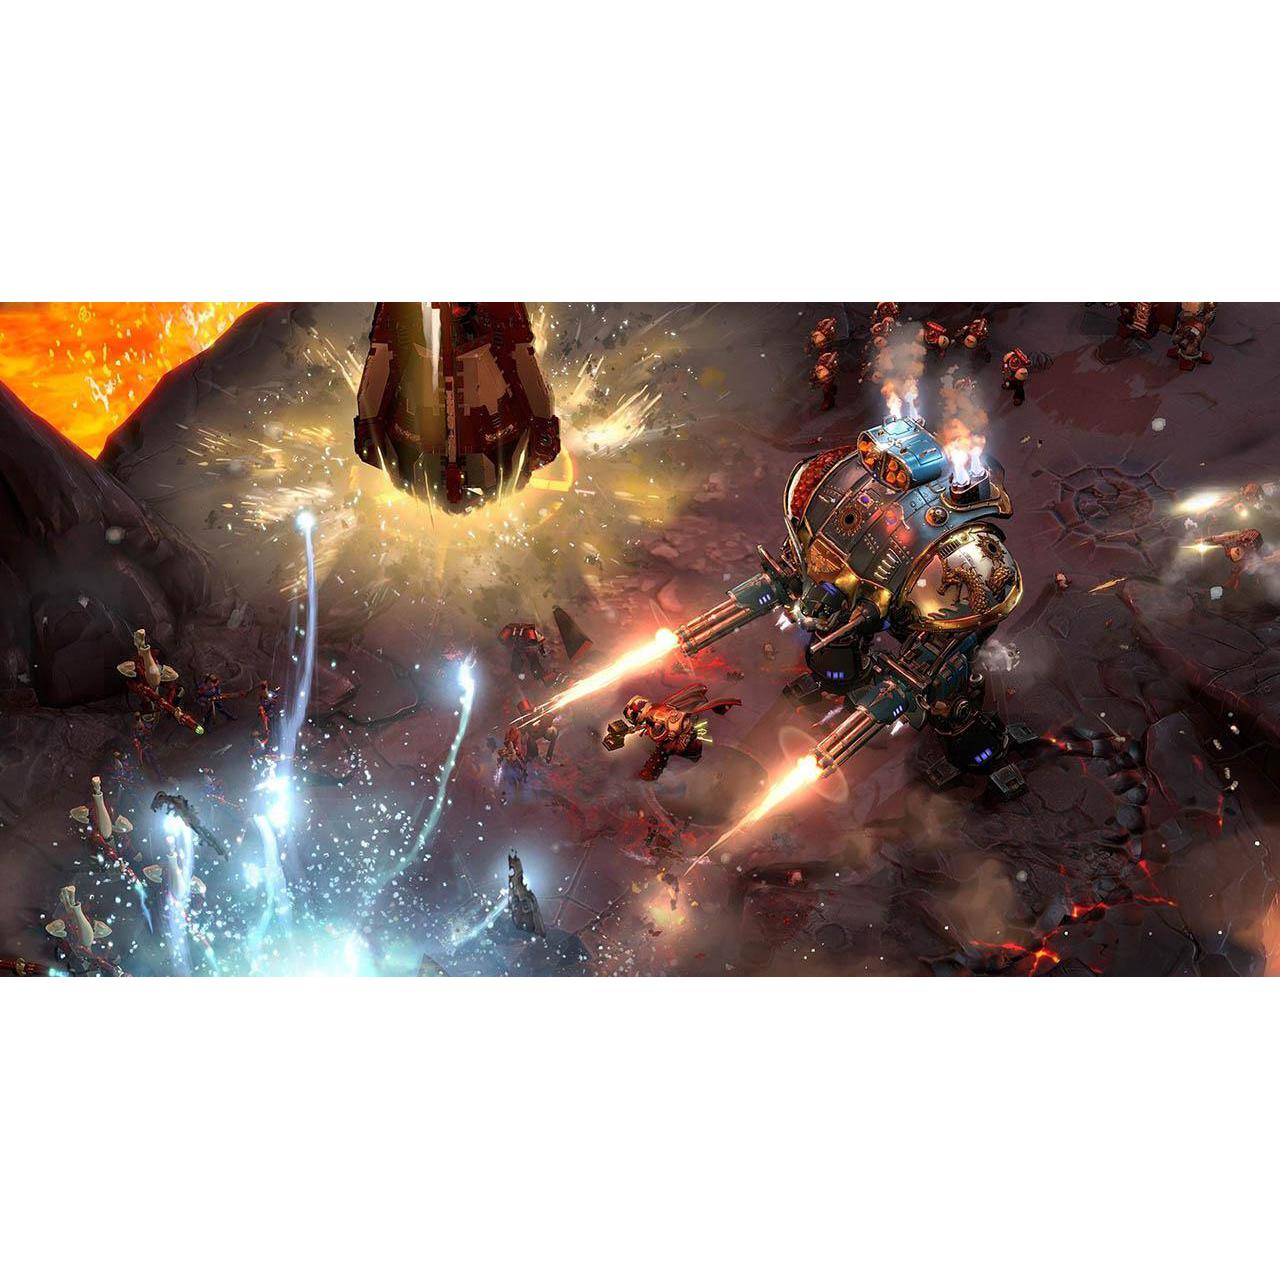 Joc Dawn Of War 3 Limited Edition pentru PC 3